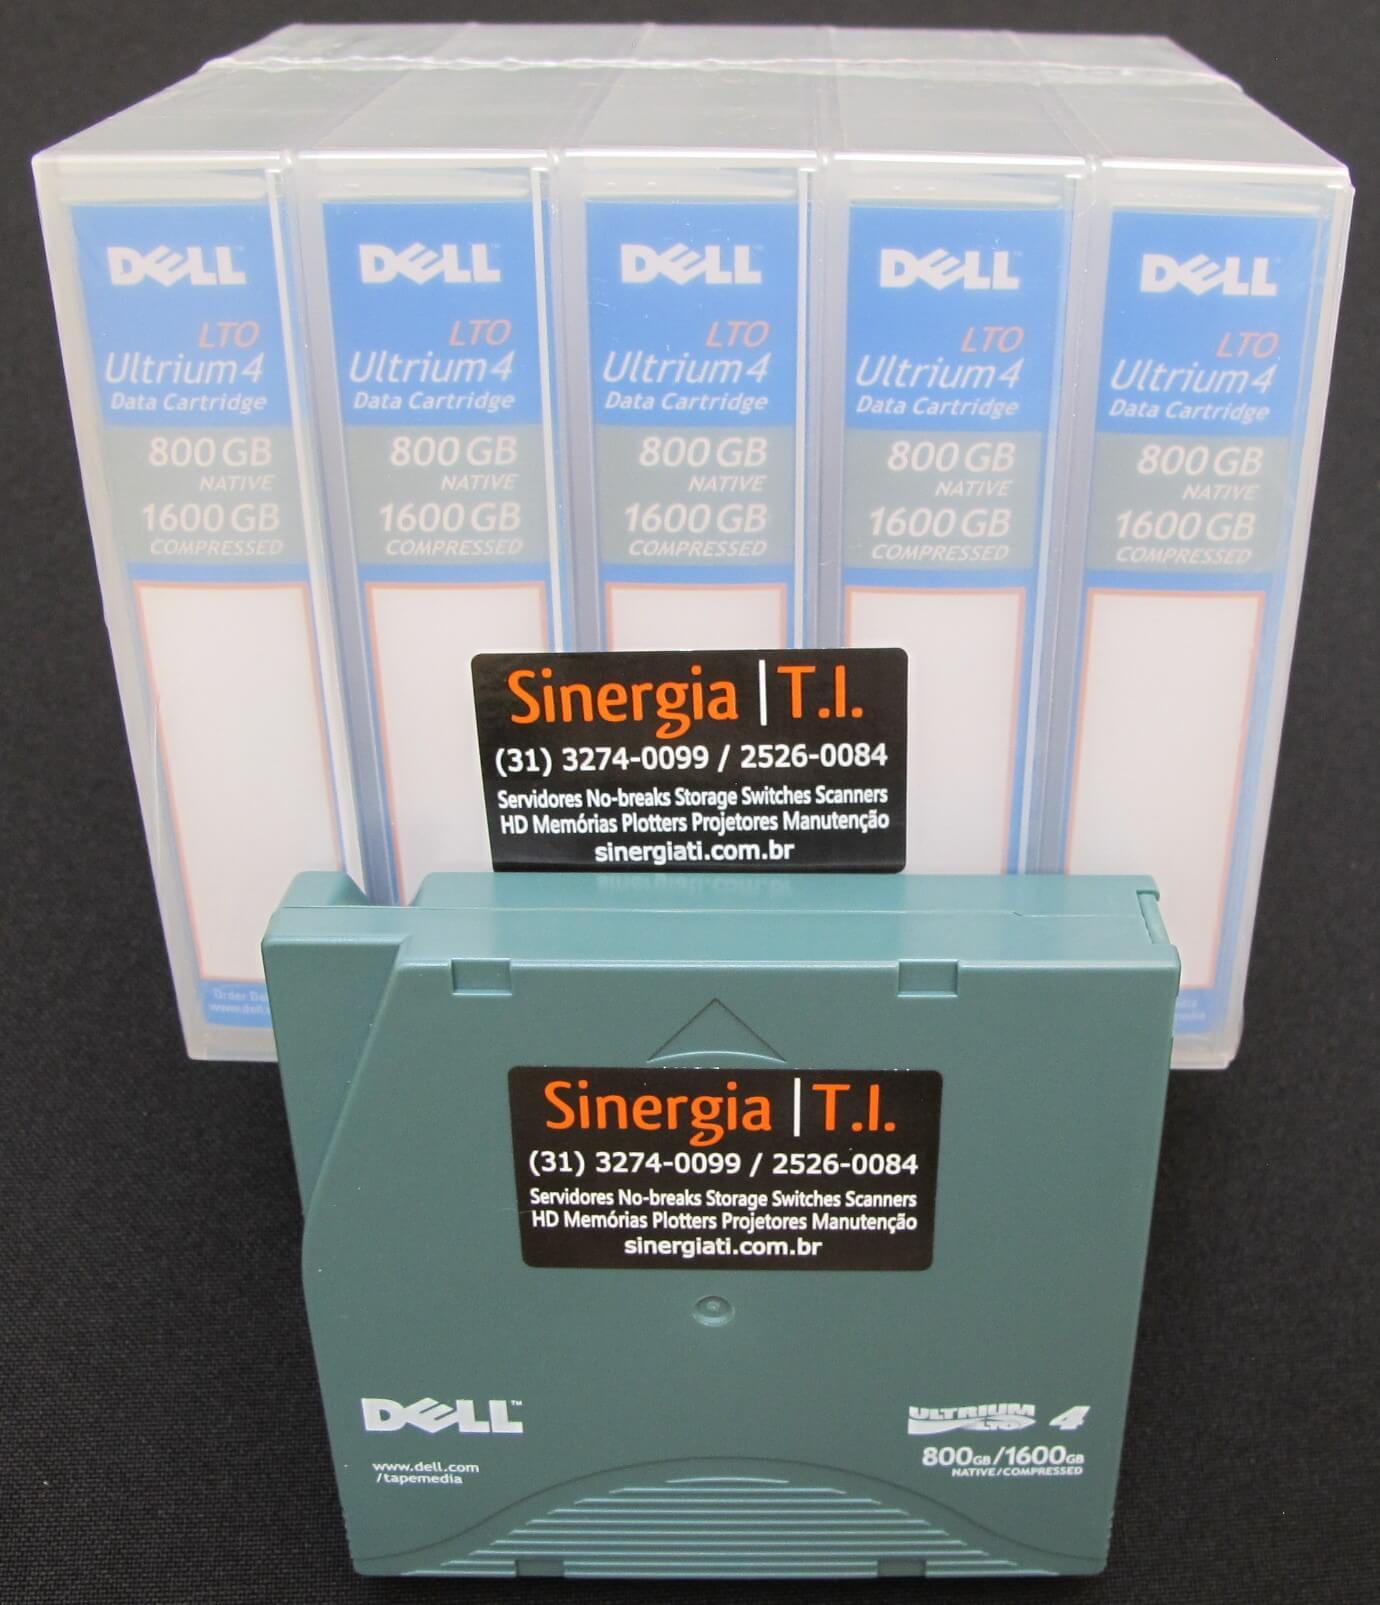 Fita de Dados LTO-4 Ultrium 4 Data Cartridge 800GB/1.6TB Dell Código do Fabricante : XW259 | Código Dell : 341-4641 foto frontal pack 5 mídias